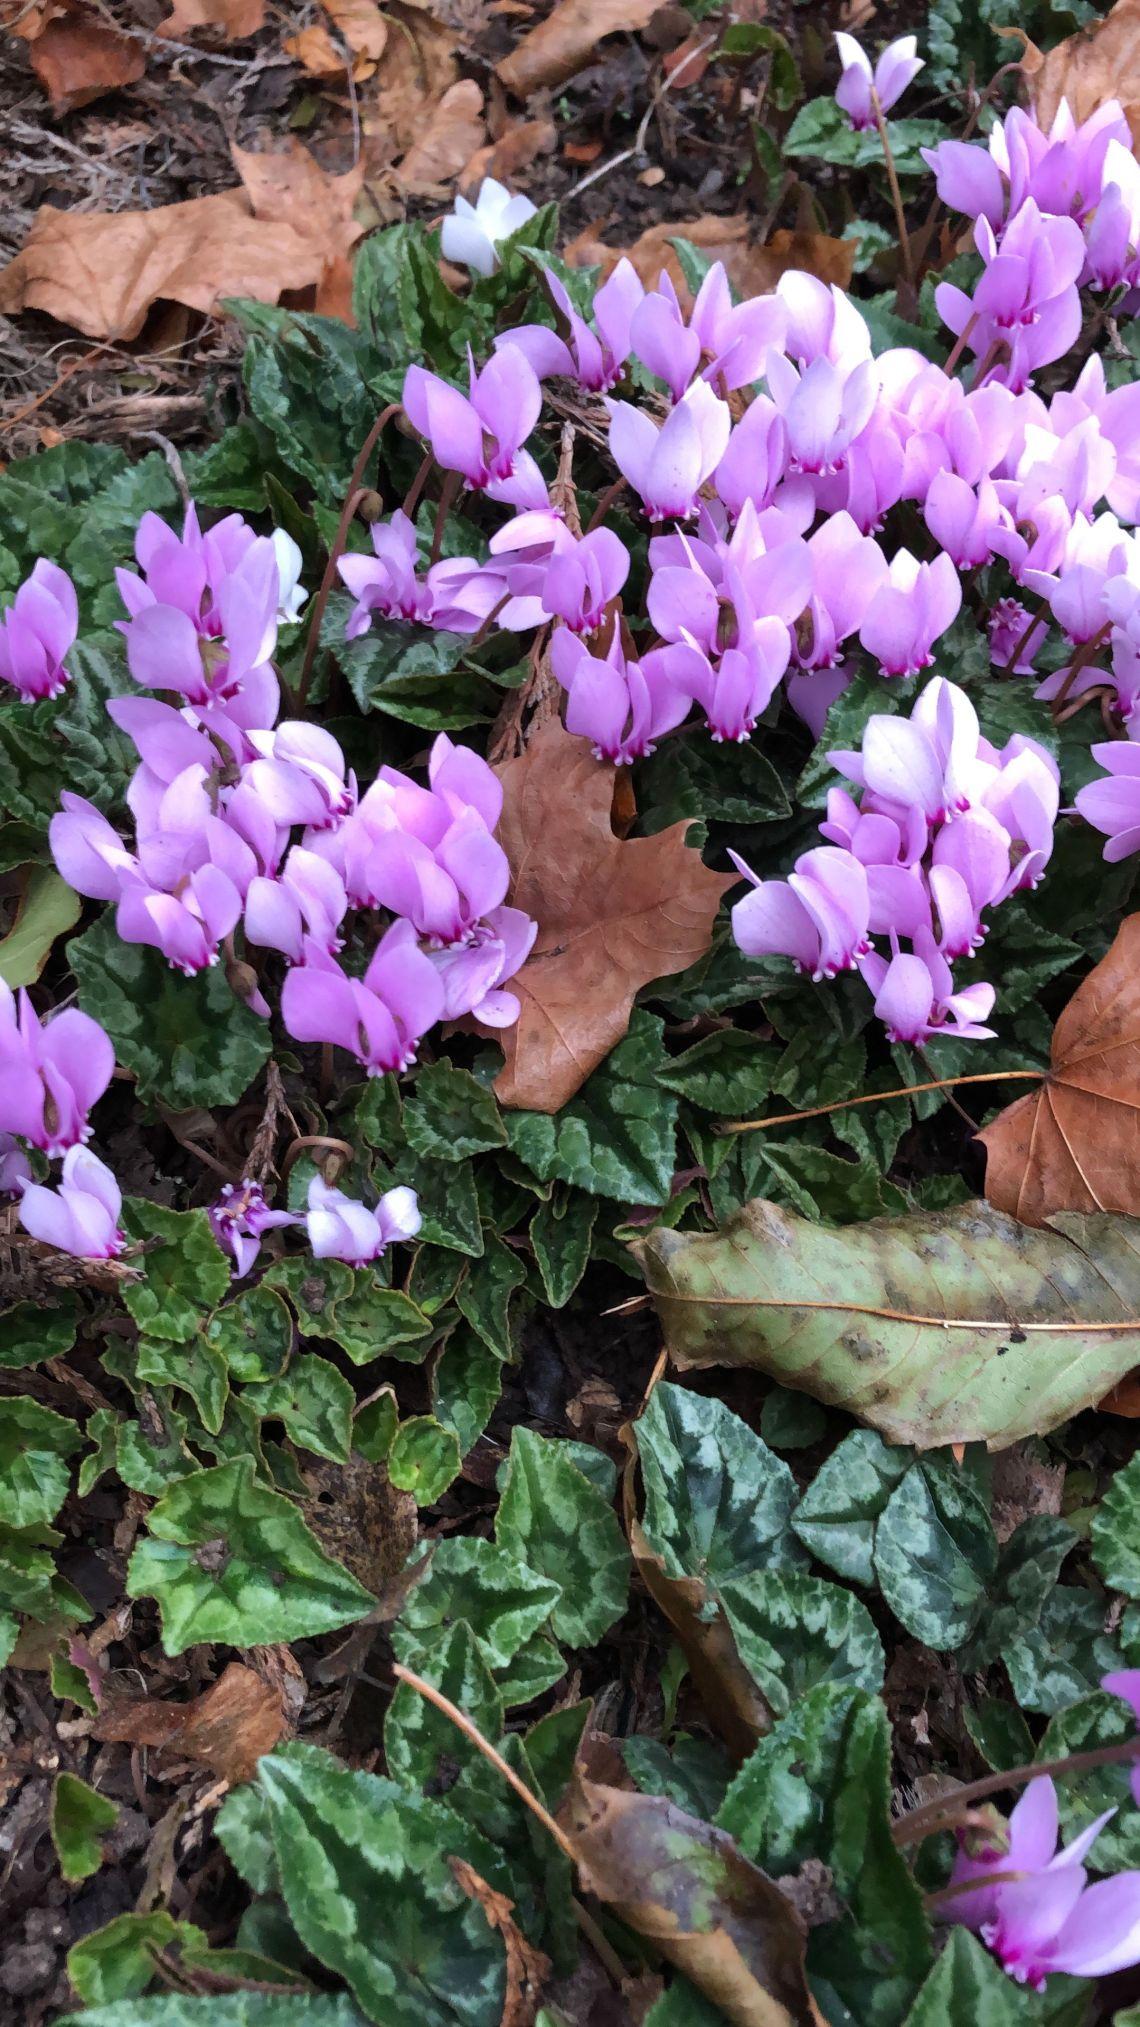 30 Best Fall Flowers To Plant Pretty Fall Plants Flowering Perennials